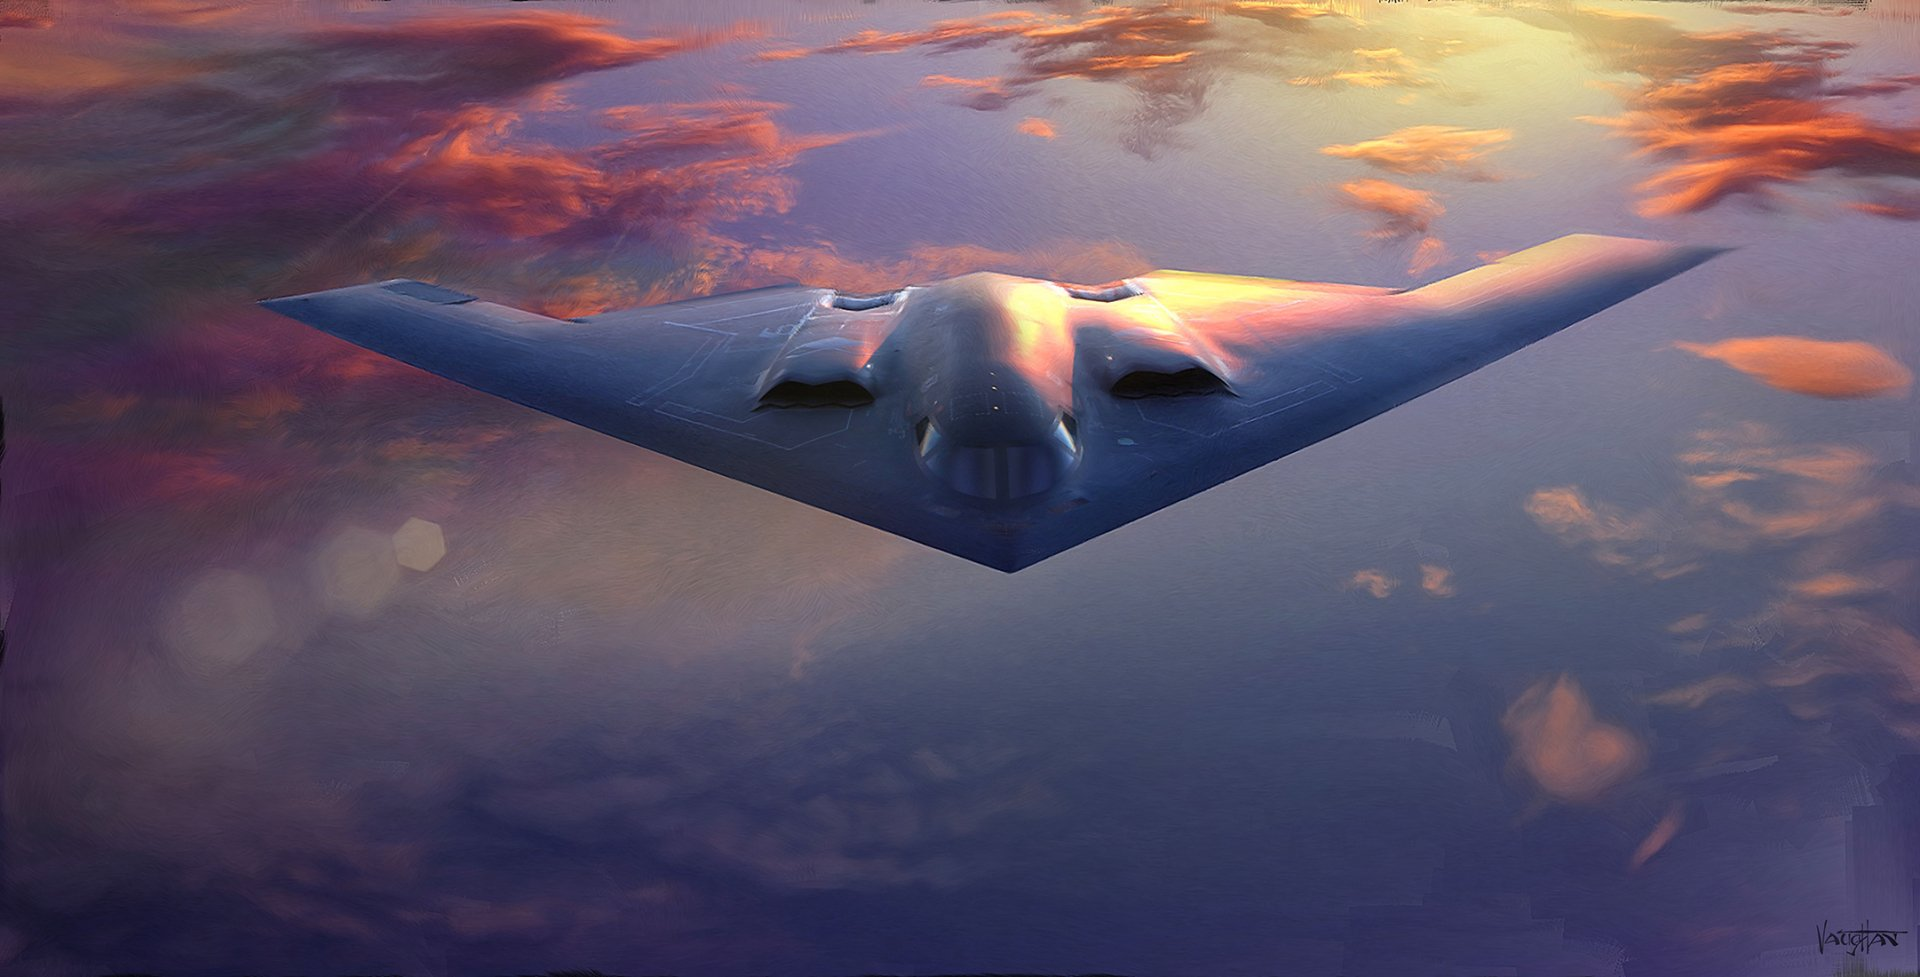 Military - Northrop Grumman B-2 Spirit  Warplane Bomber Aircraft Air Force Airplane Military Wallpaper